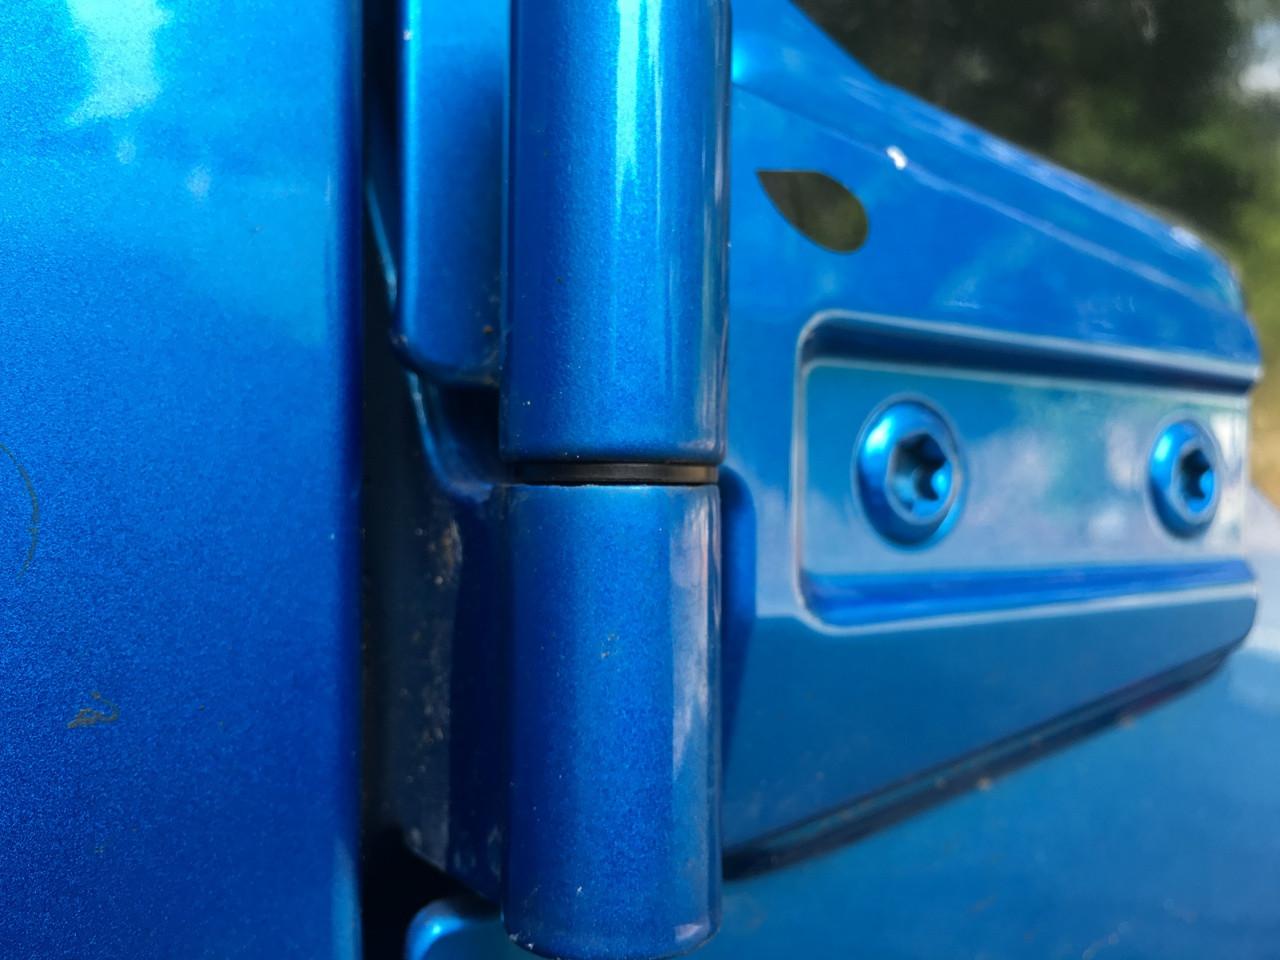 Enjoy your smooth gliding door!